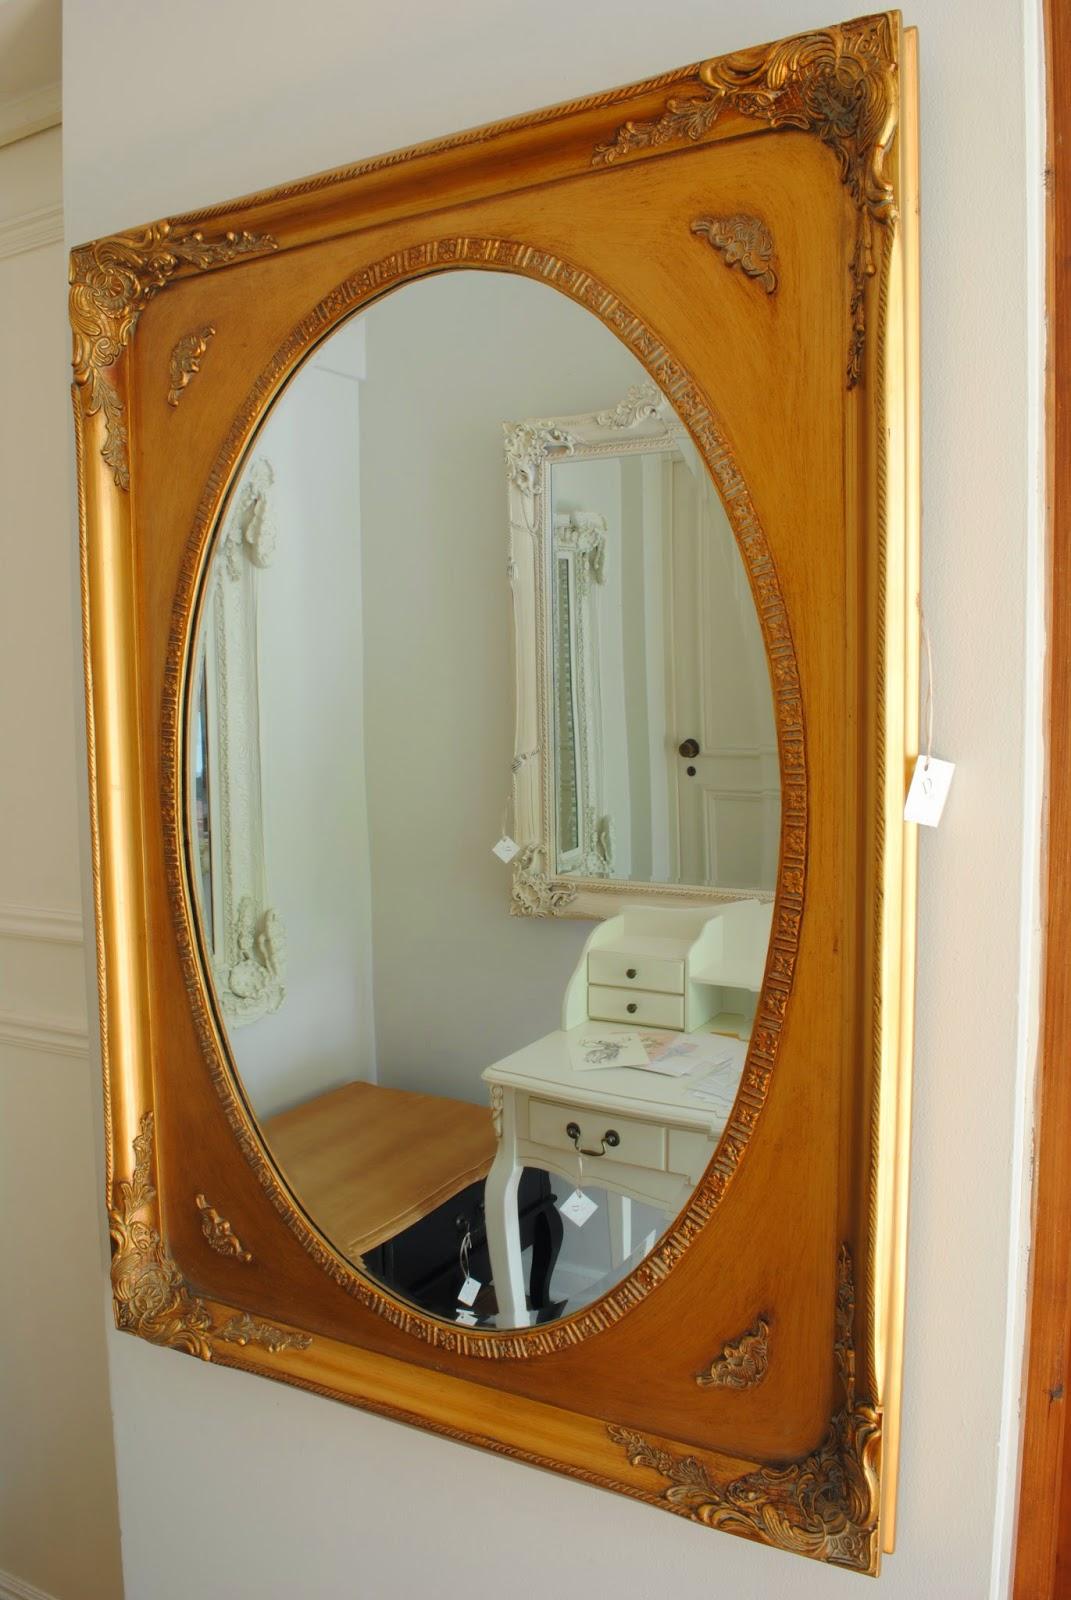 Paz montealegre decoraci n espejos estilo barroco for Espejo barroco